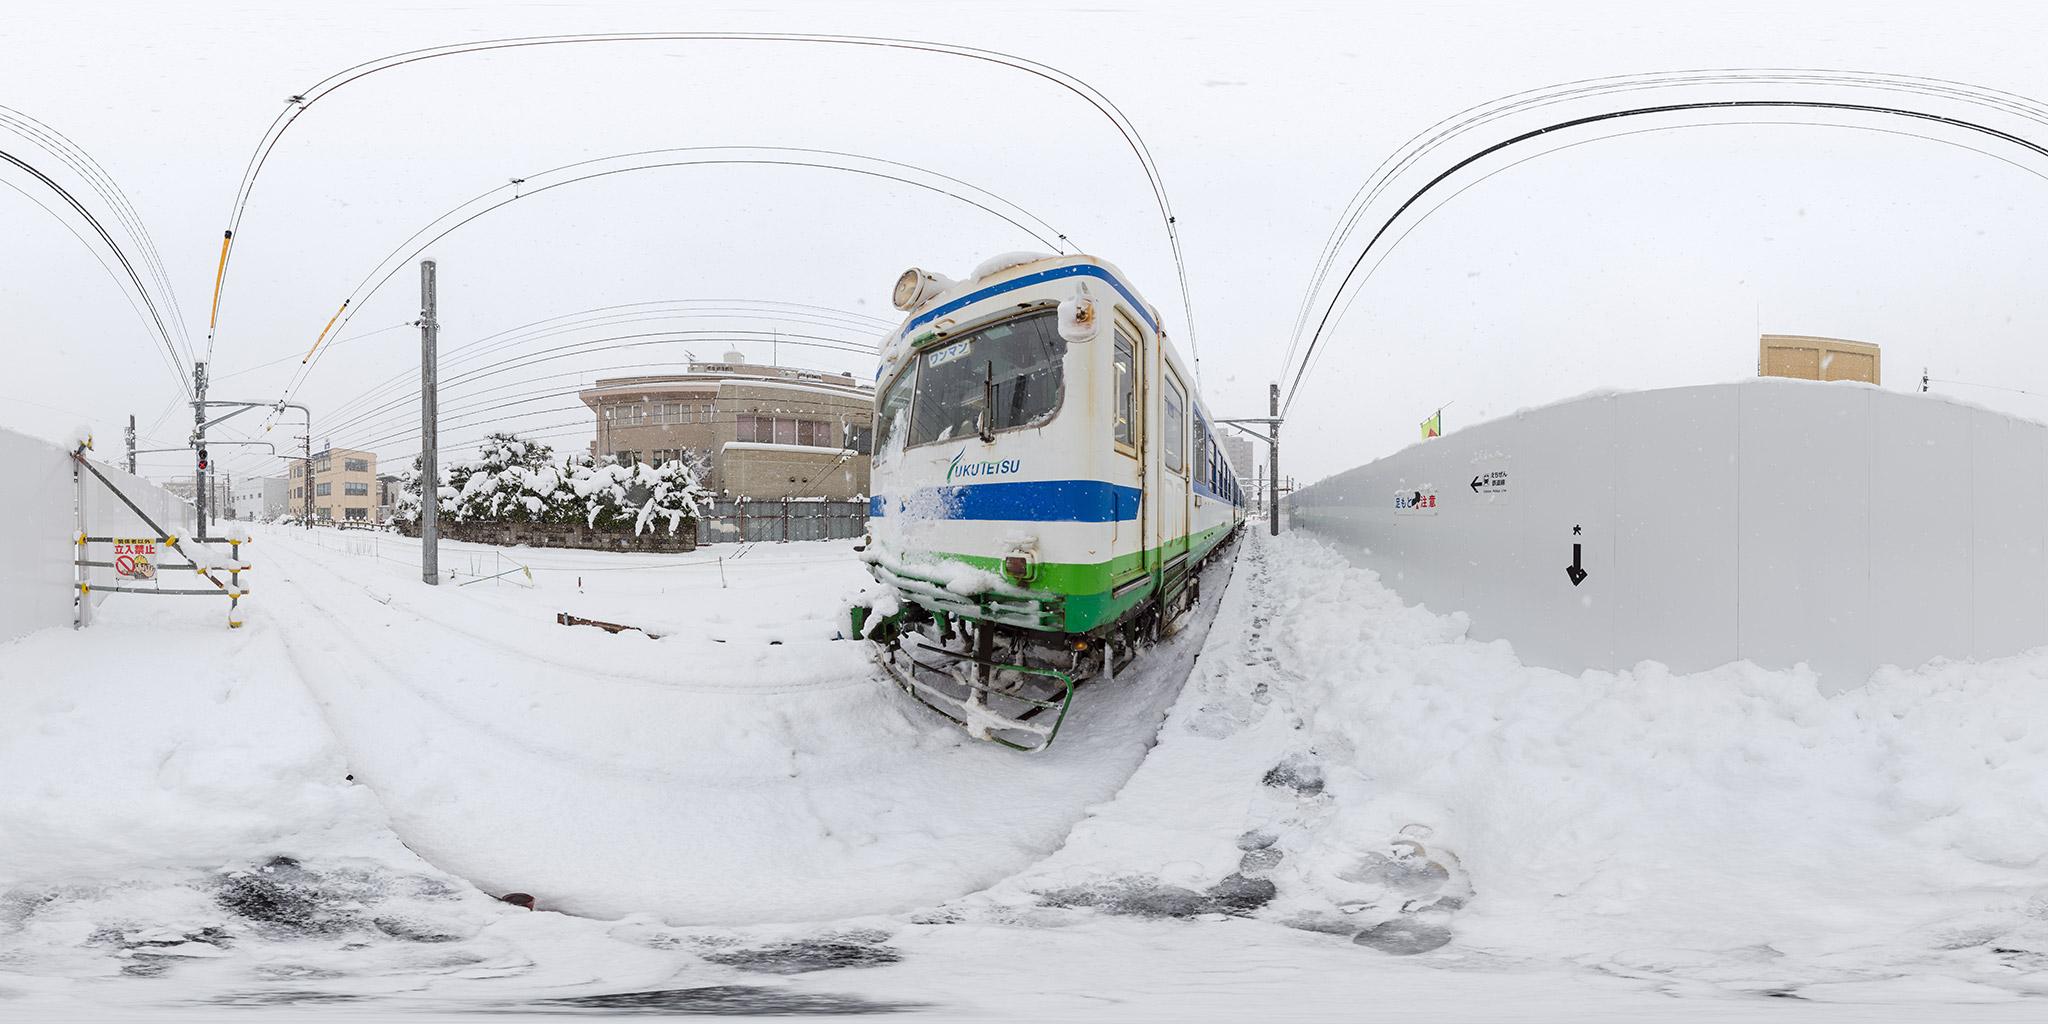 福井鉄道田原町駅に停車中の200形202編成